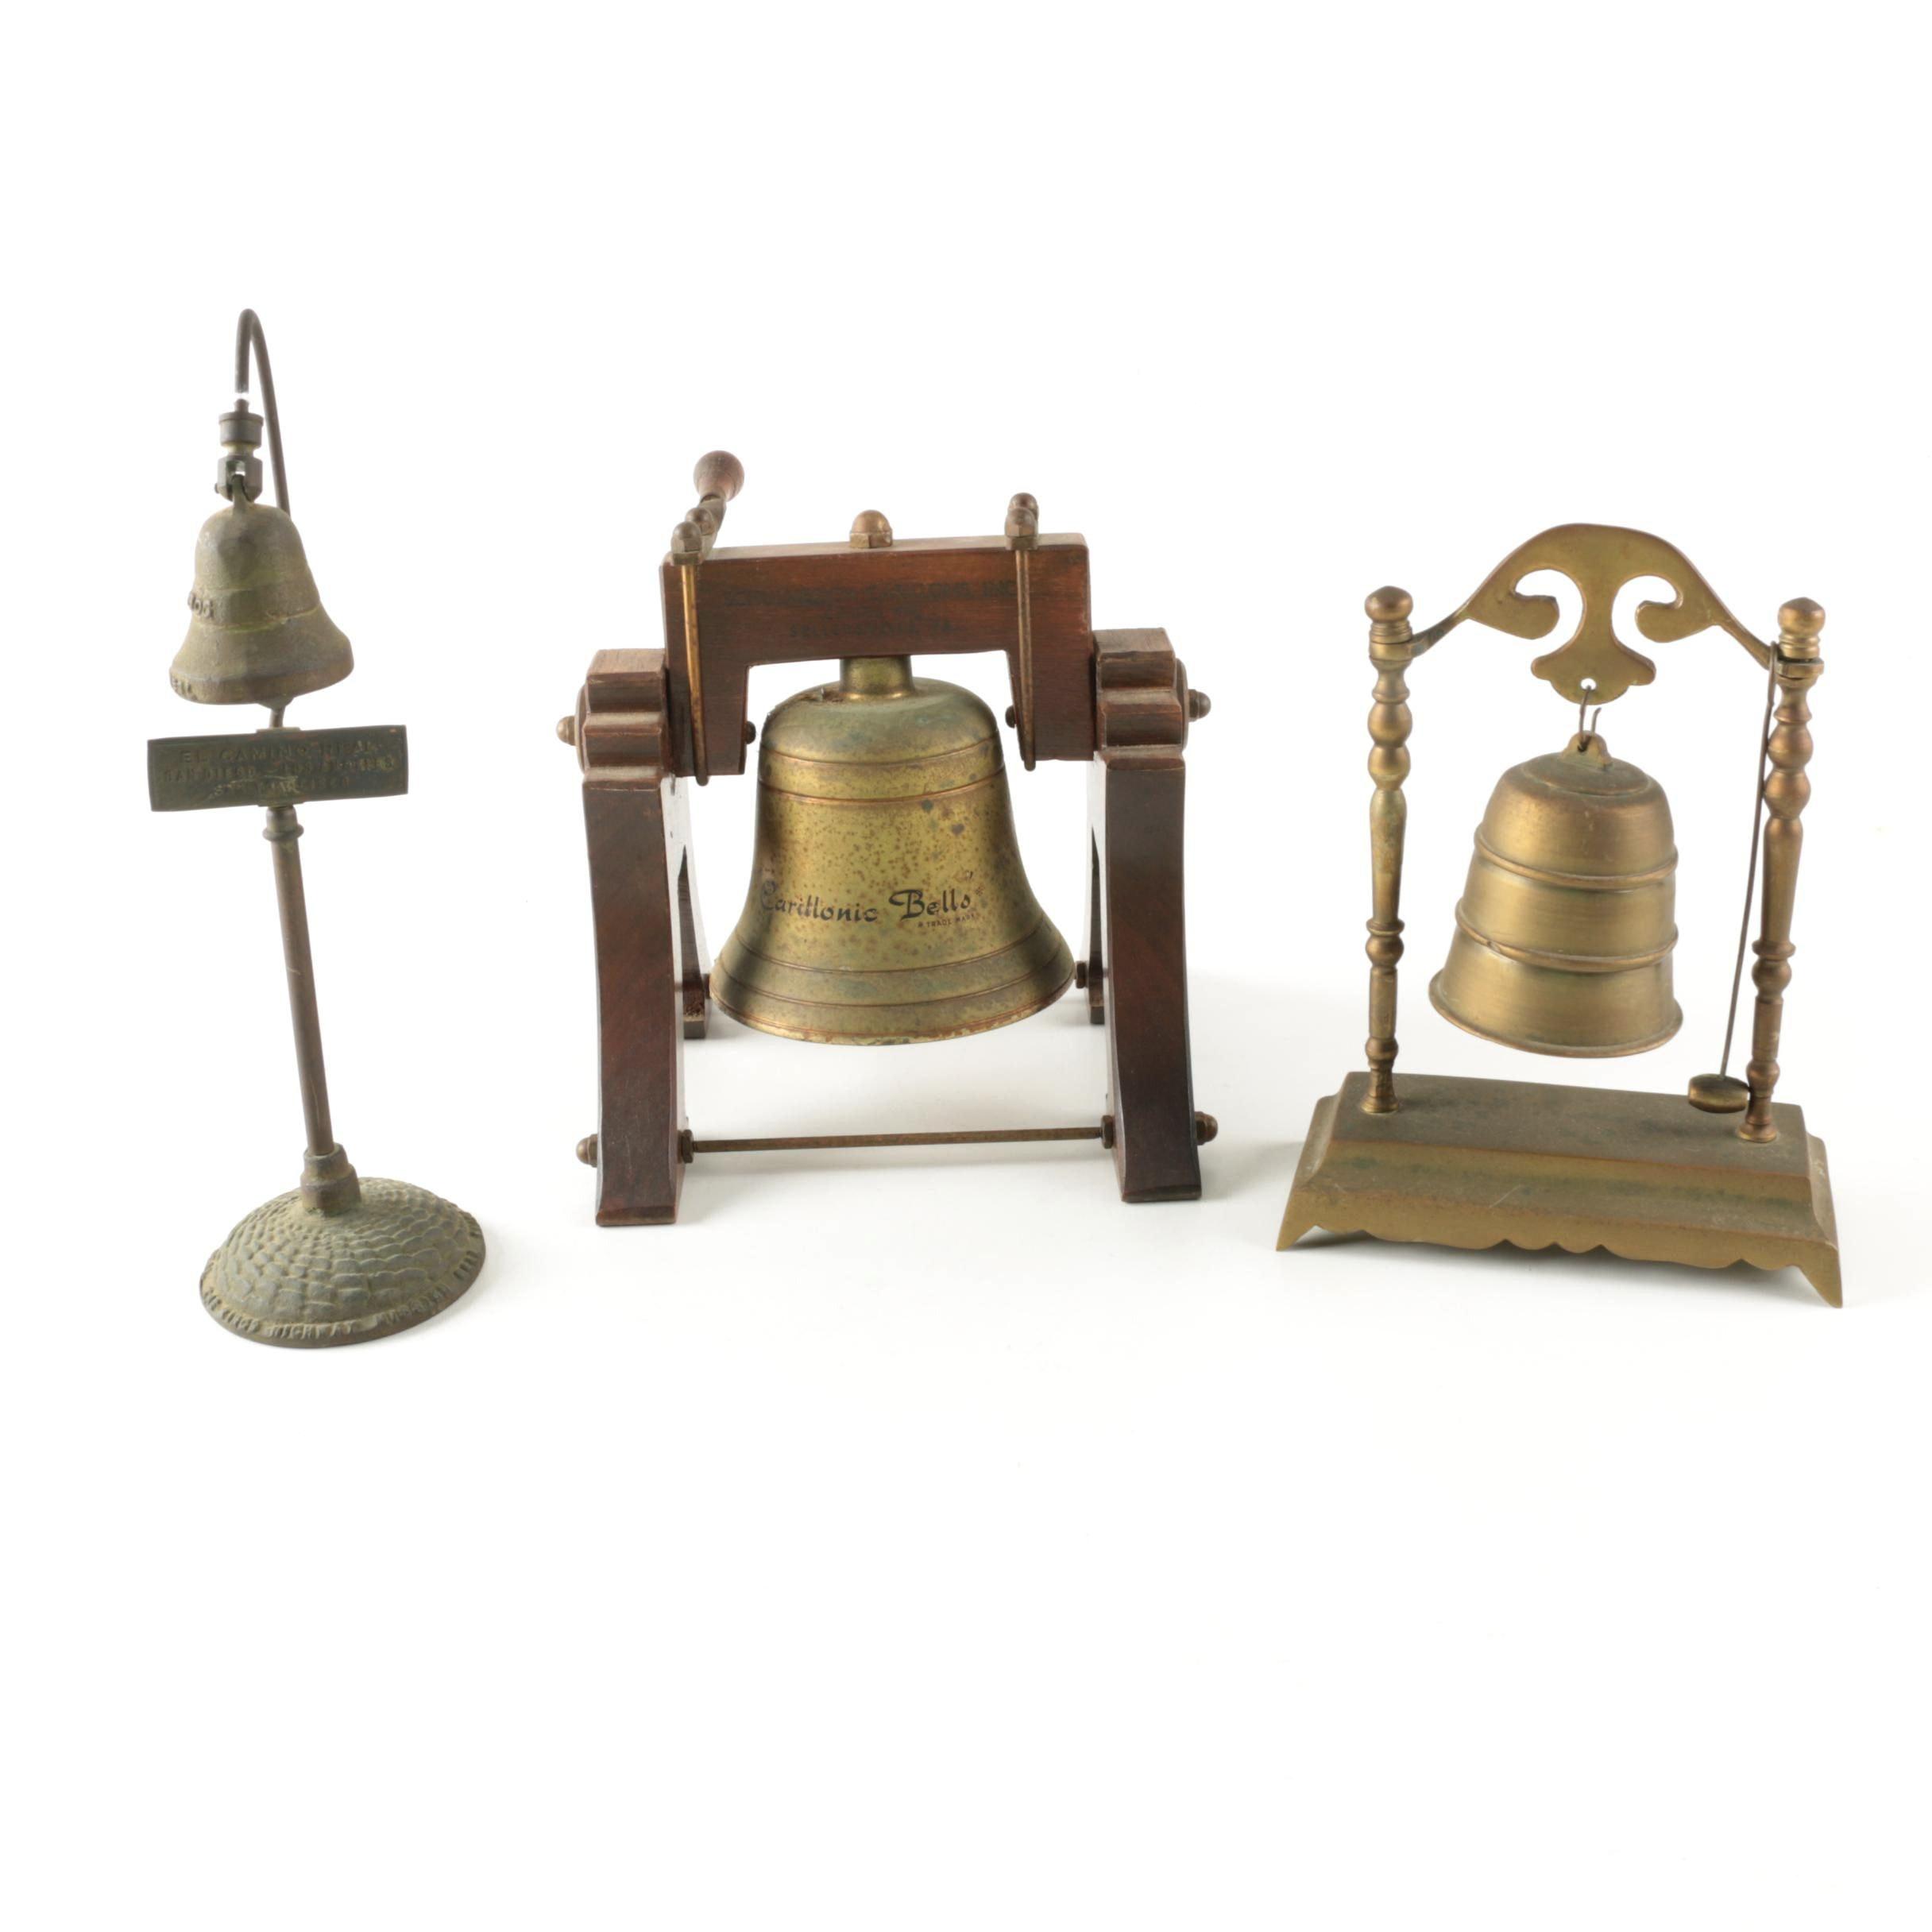 Antique and Vintage Metal Hanging Bells